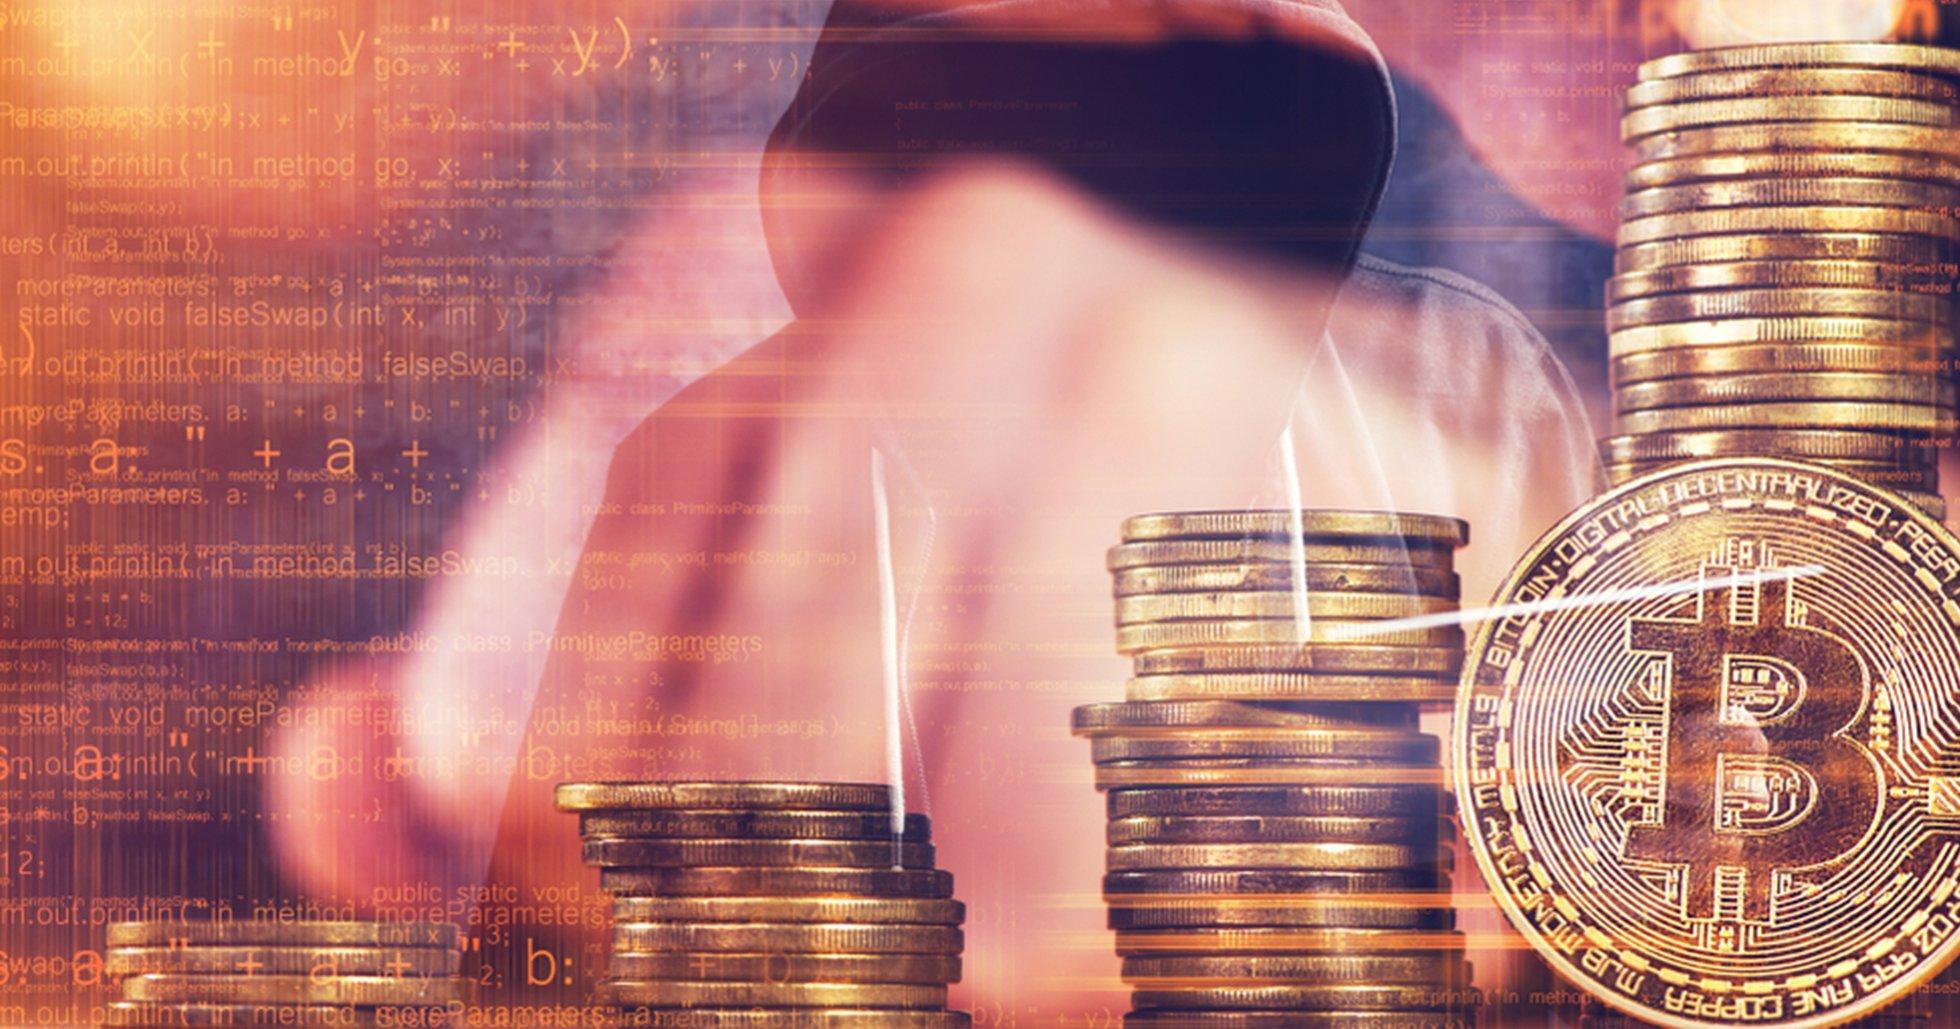 New report reveals: Criminals have stolen $4.3 billion in cryptocurrency in 2019